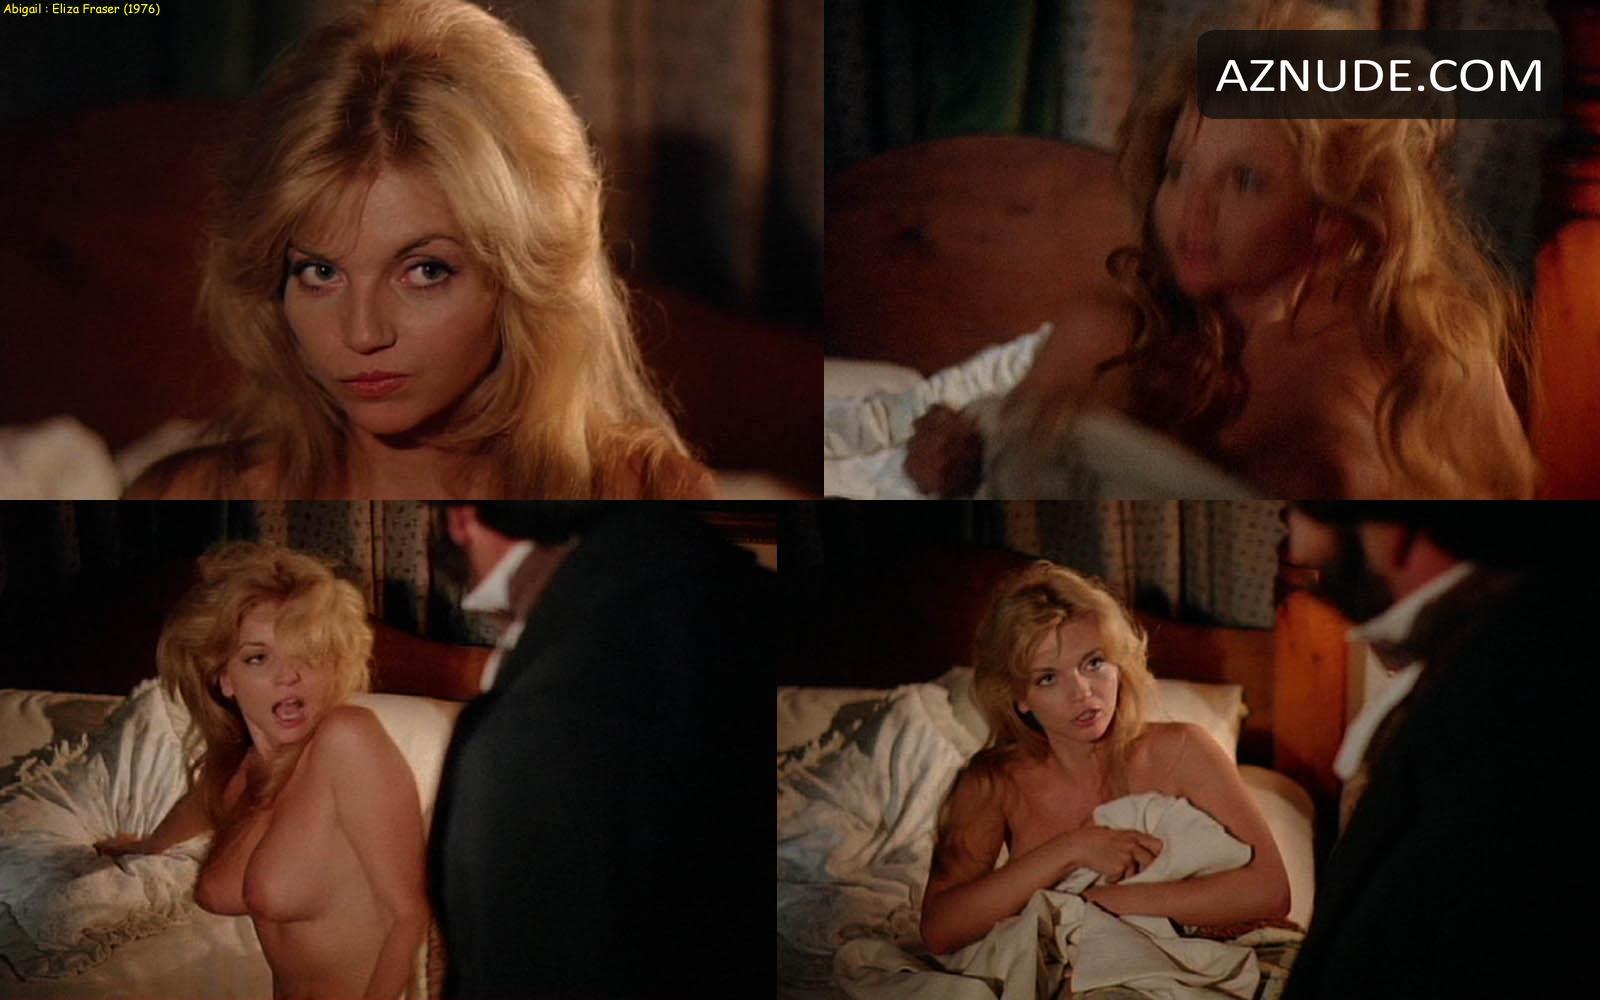 Nude abigail Actress Abigail